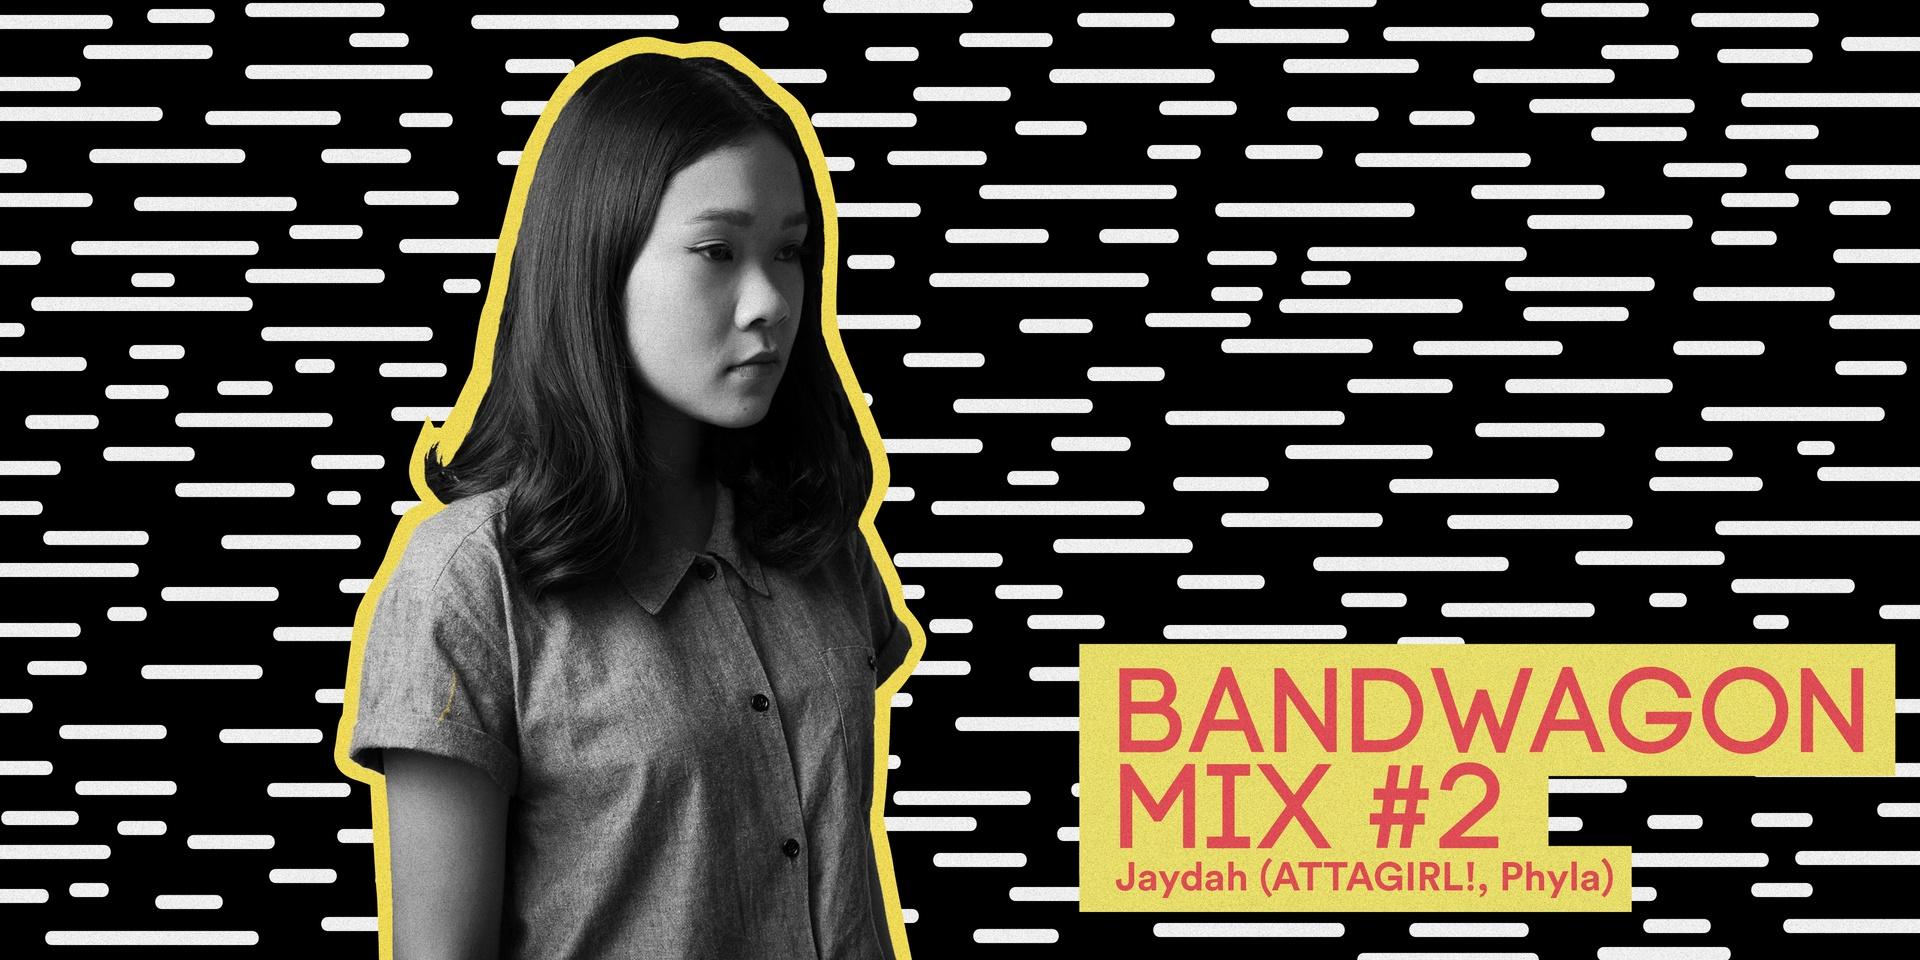 Bandwagon Mix #2: Jaydah (ATTAGIRL)